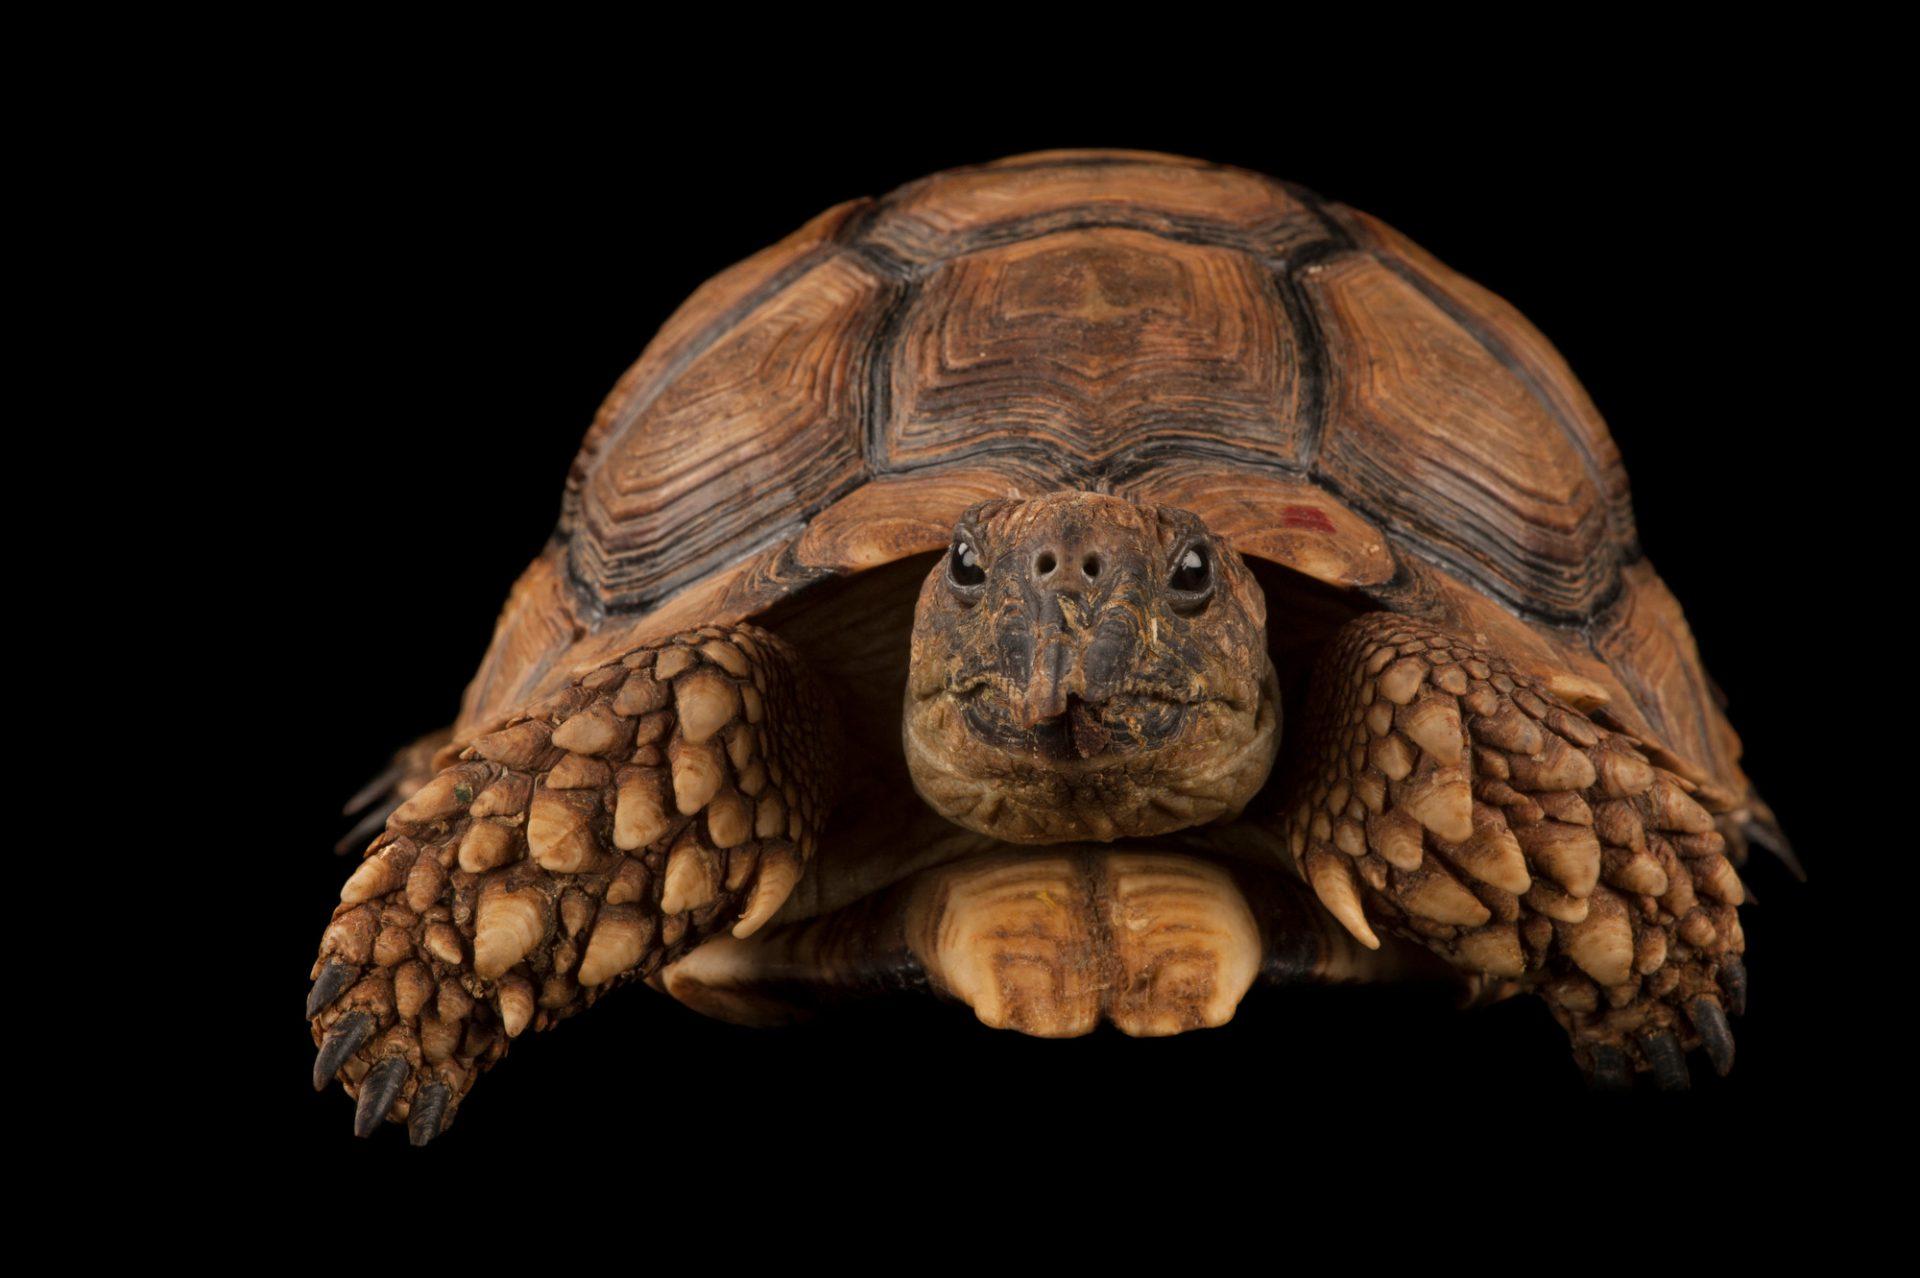 A chaco tortoise (Chelonoidis petersi) at Zoo Atlanta.